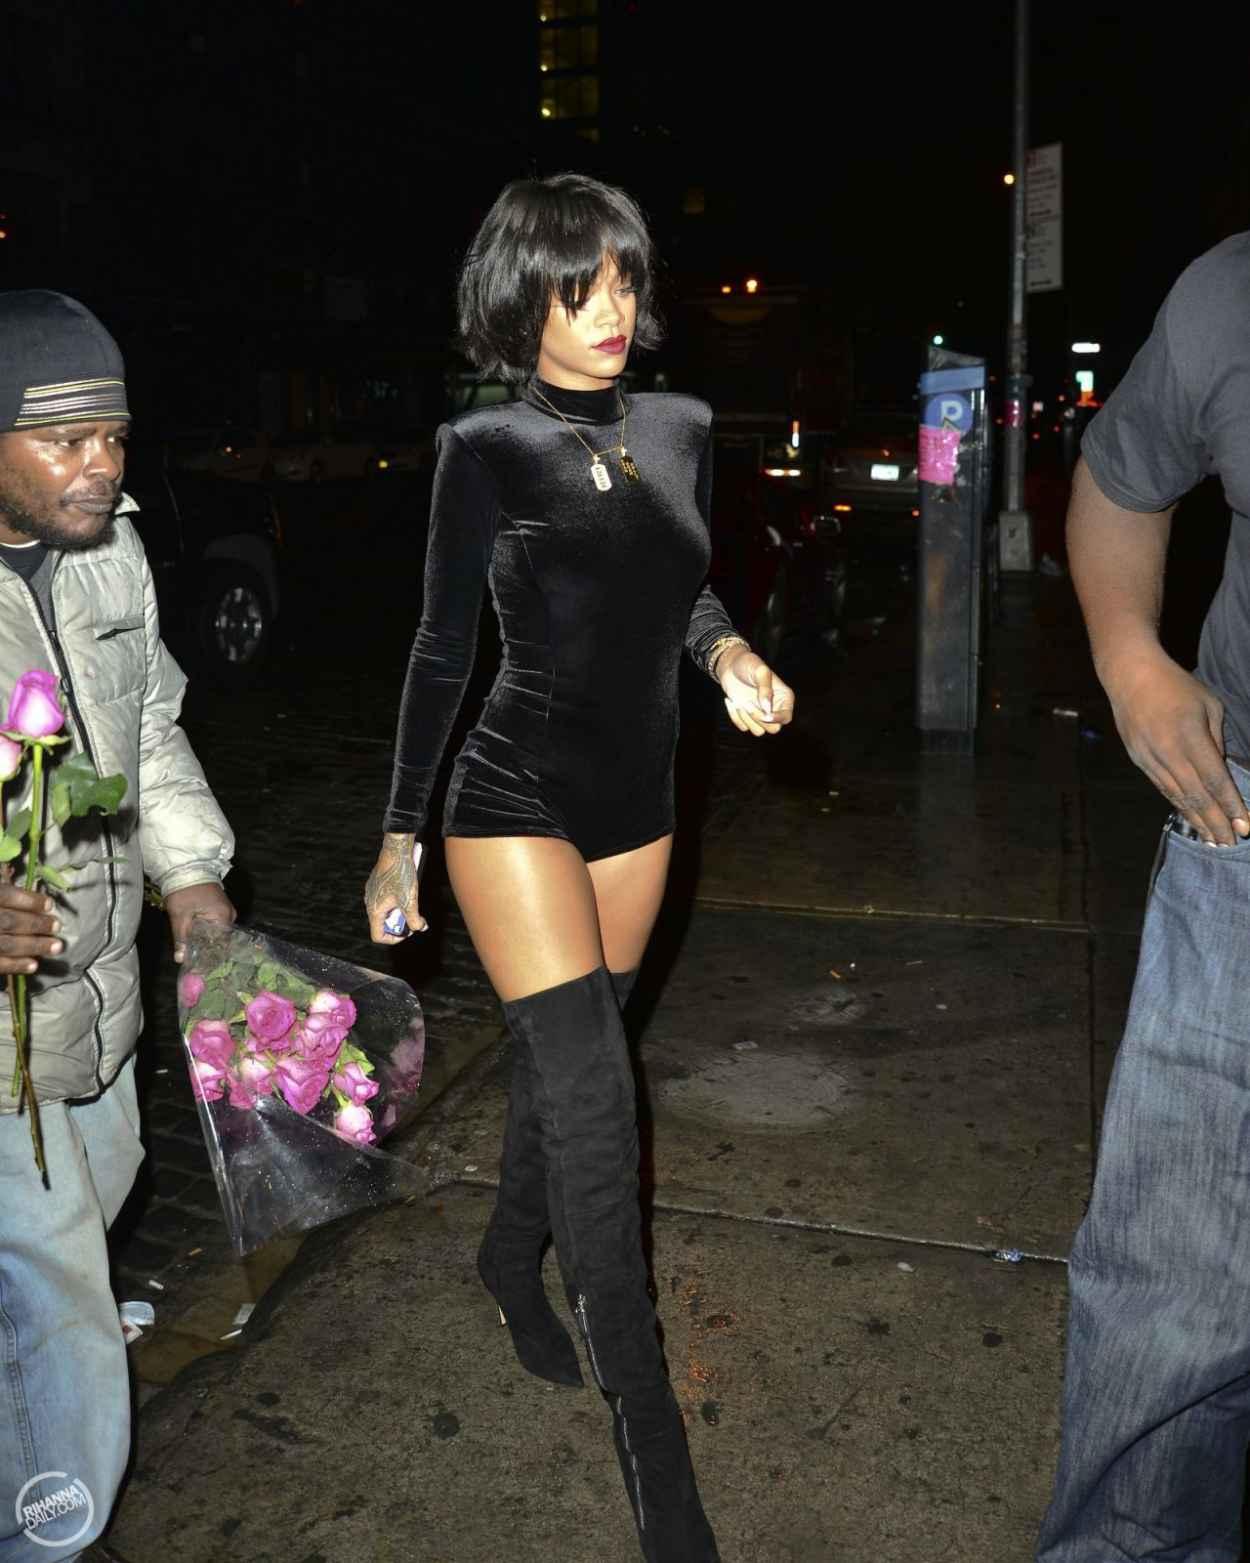 Rihanna Street Style - Wearing a short Jumpsuit in New York City - November 2015-5